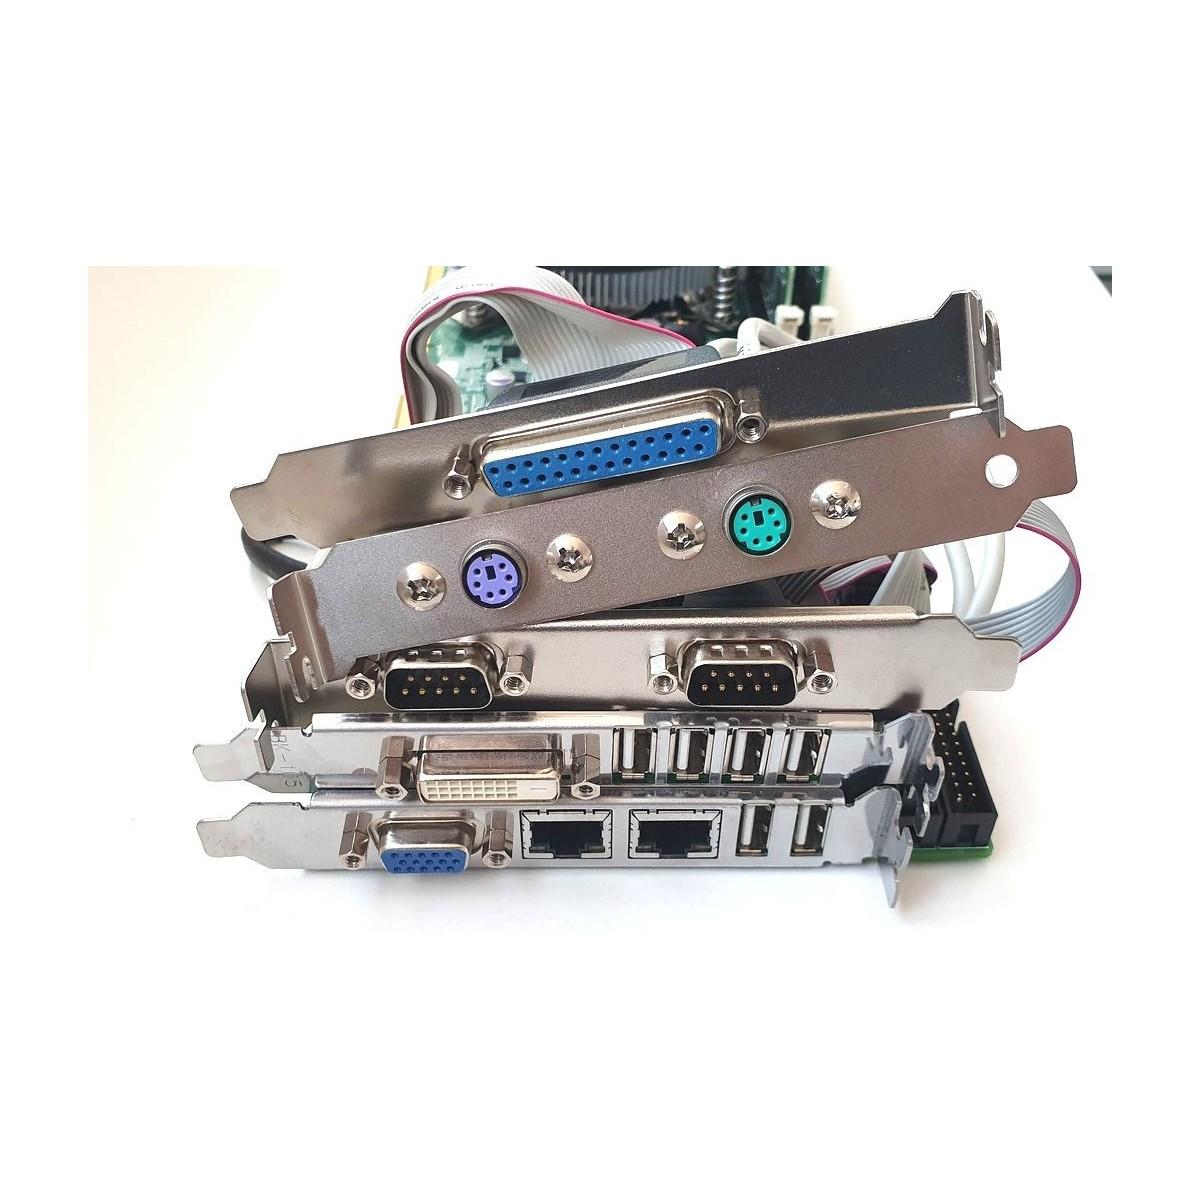 DELL T7500 2xQC 48GB 600GB VELOCI K4000 WIN7